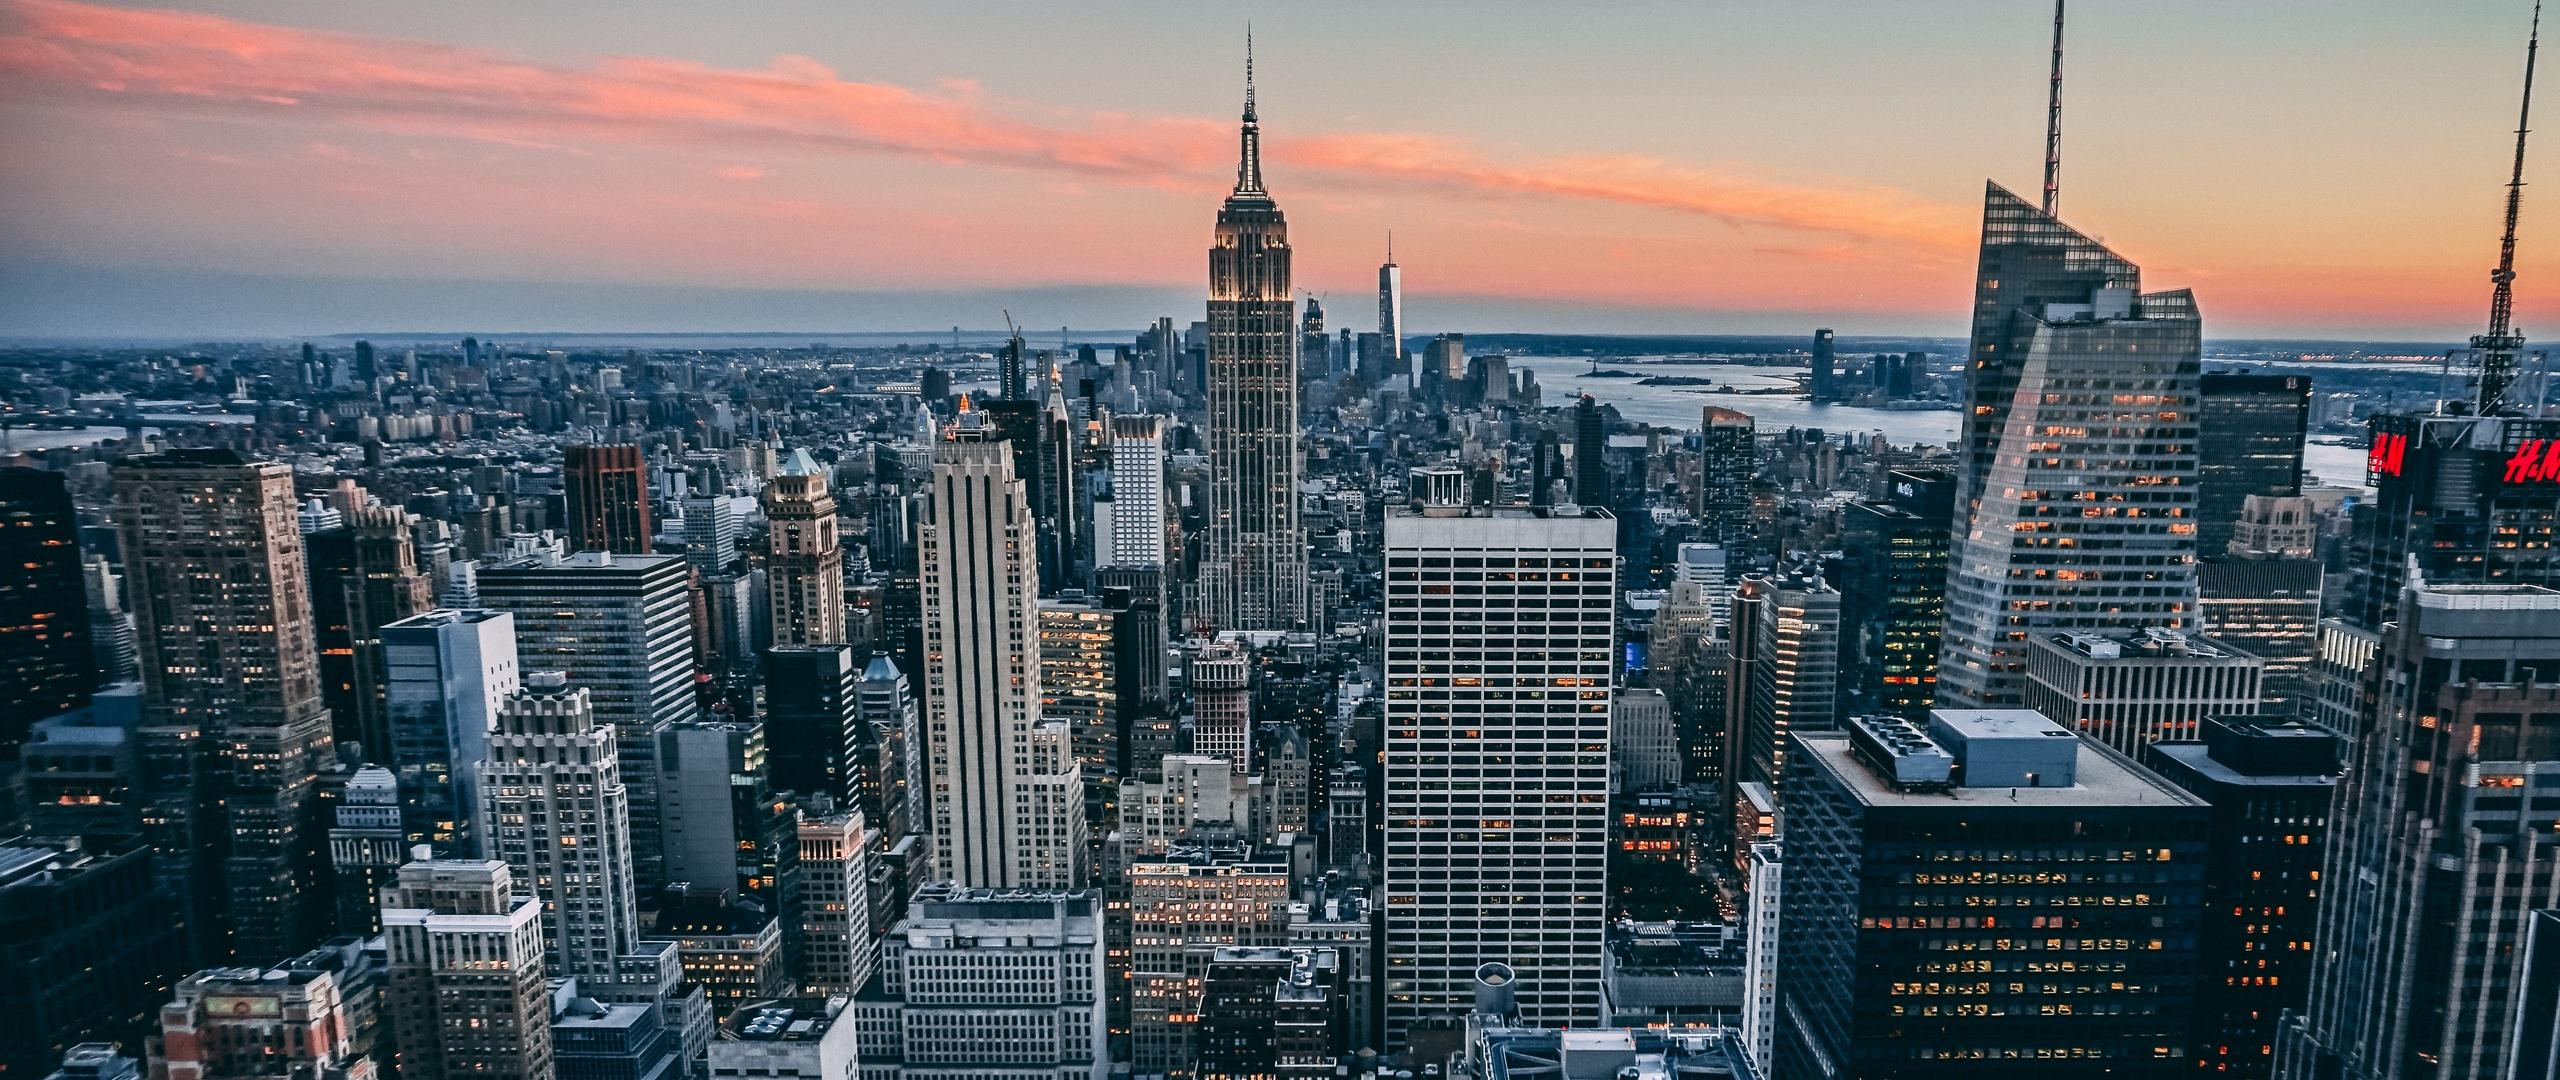 Wallpaper Manhattan New York Usa Skyscrapers New York City 2560x1080 Wallpaper Teahub Io